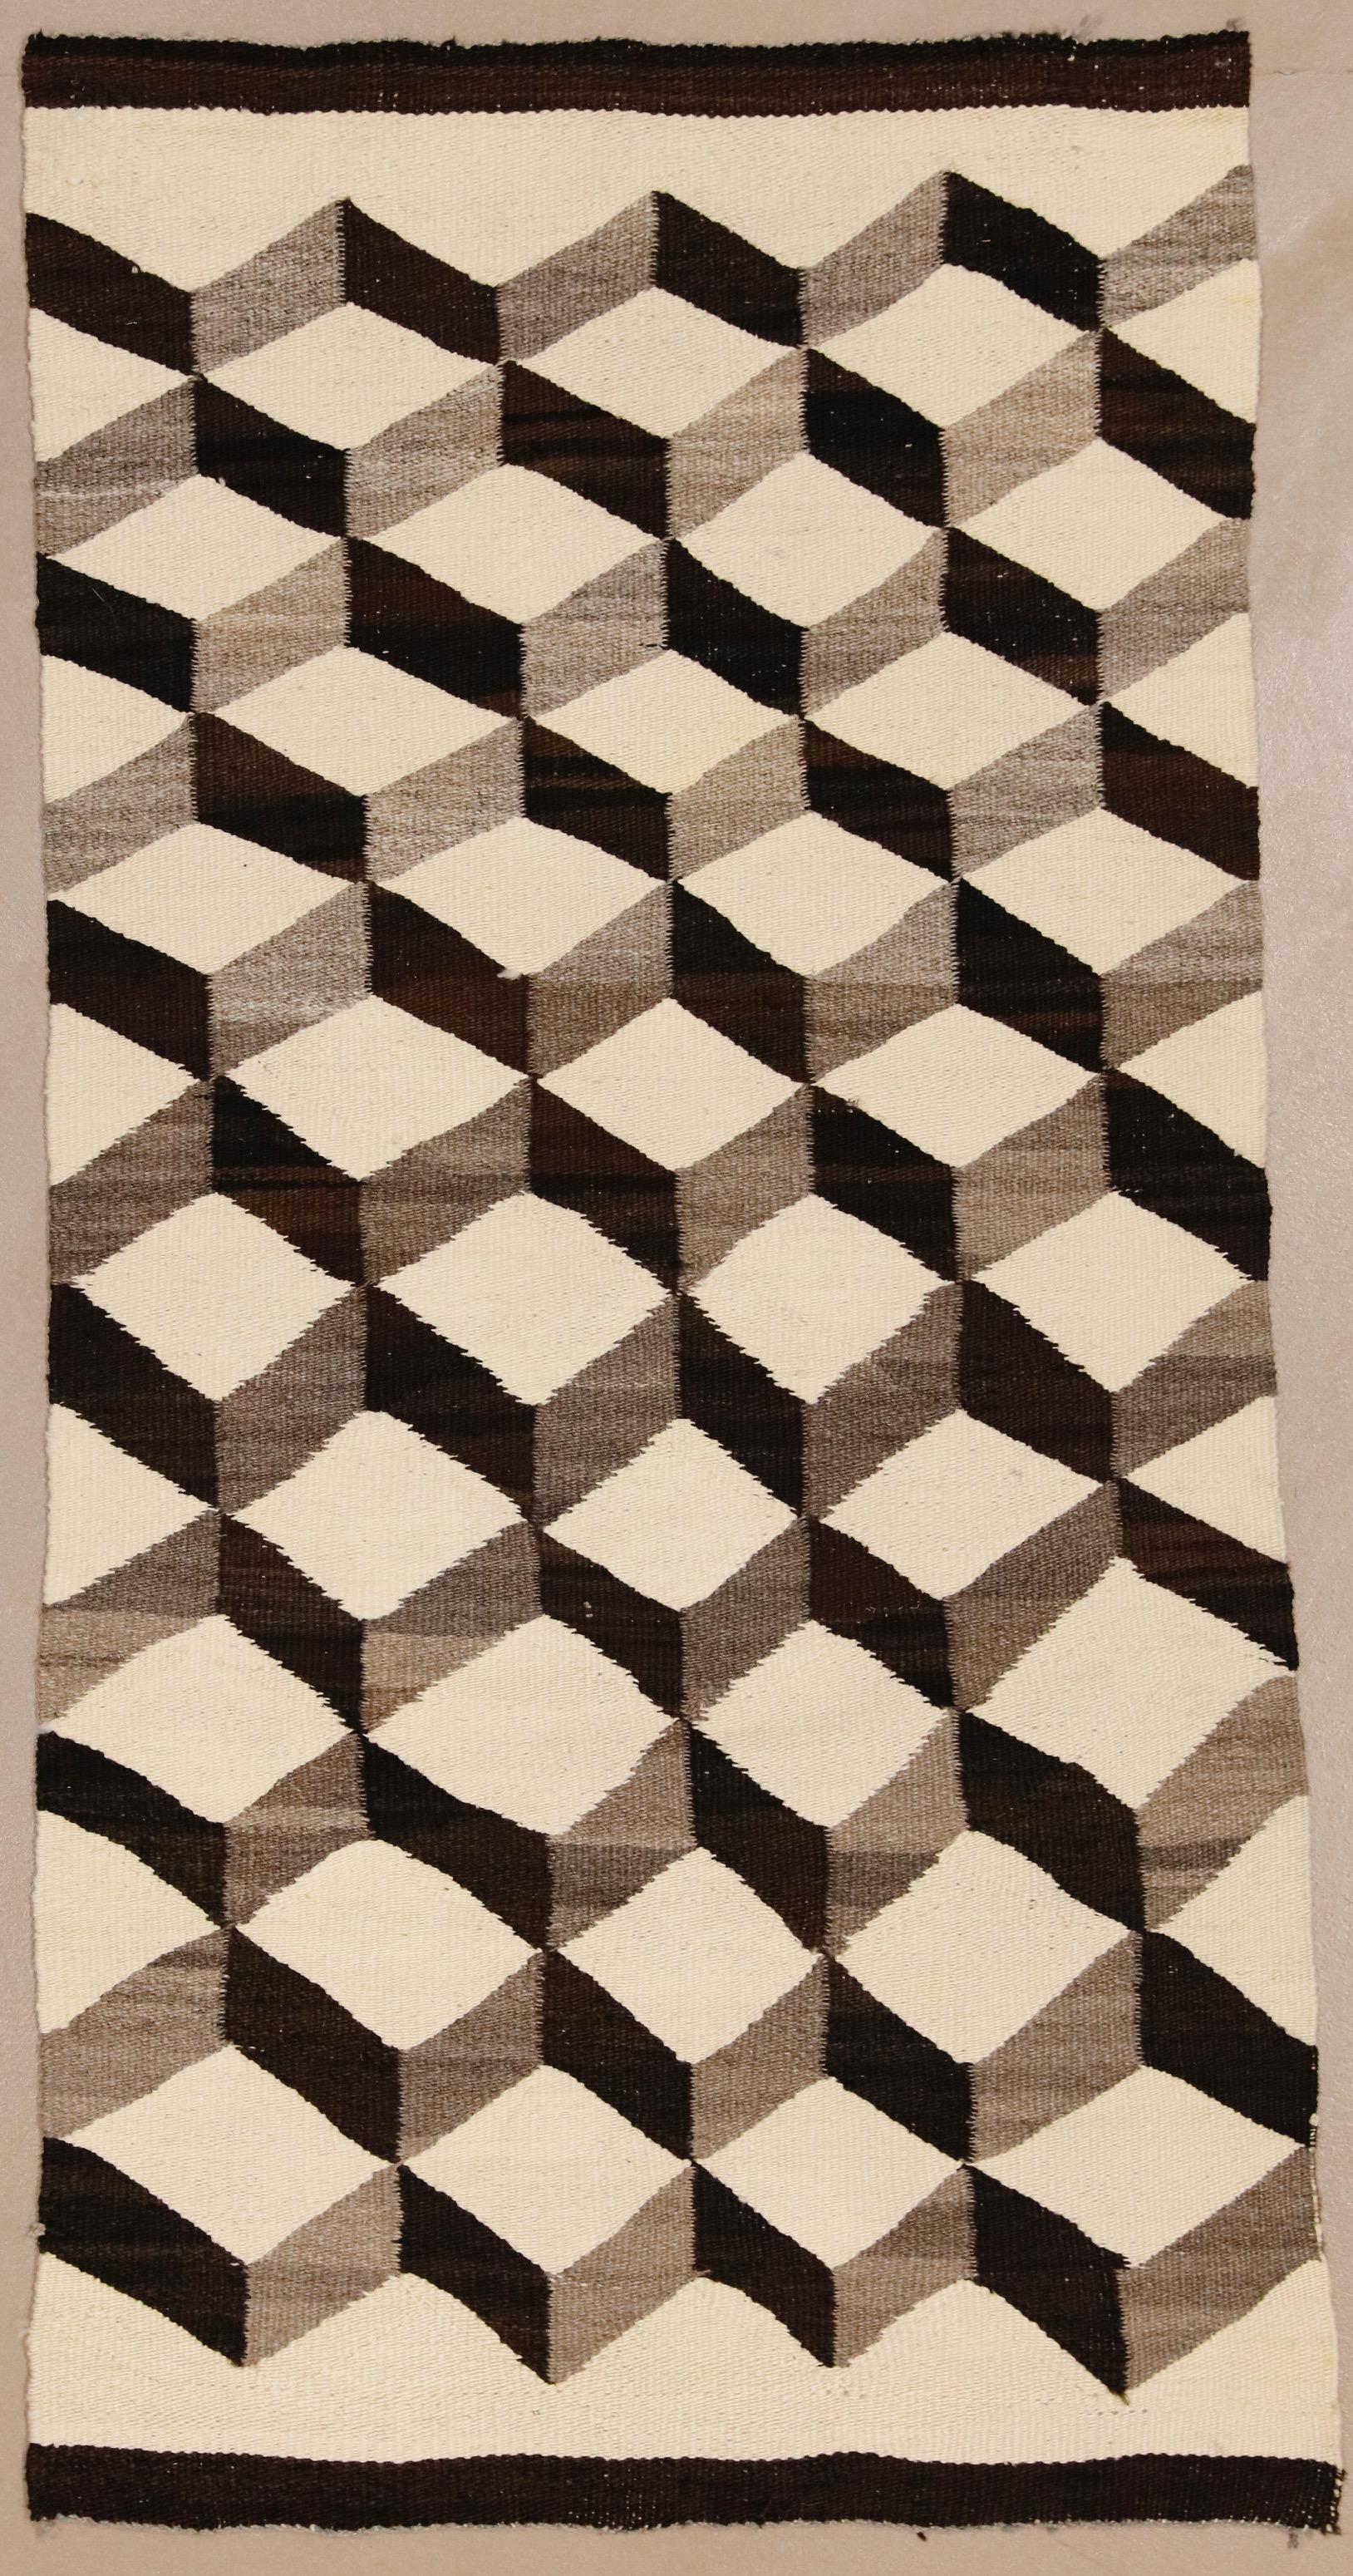 1920s Vintage Navajo Tumbling Blocks Rug 2 6 5 1 Chairish